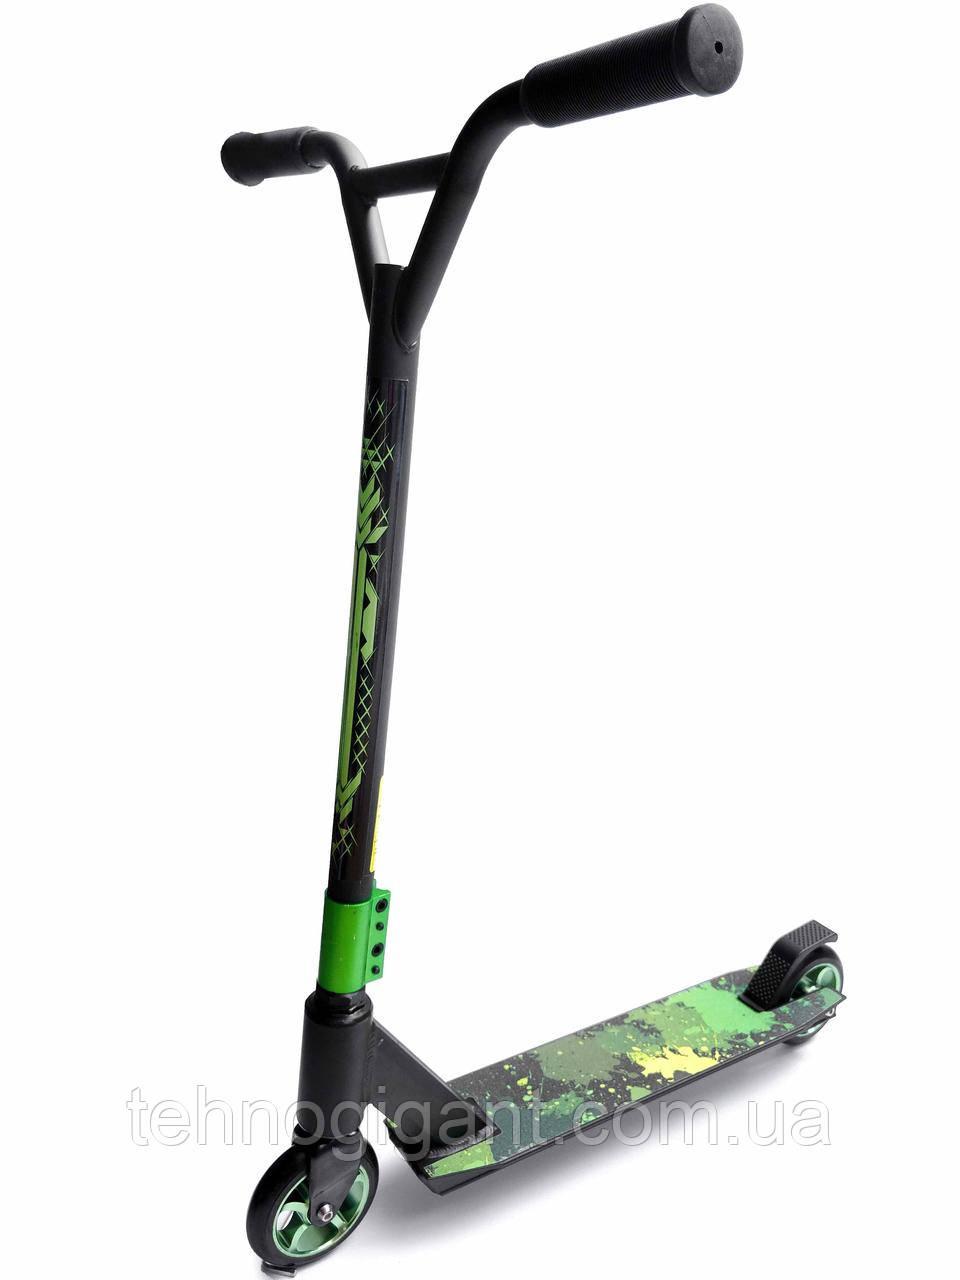 Трюковый Самокат от Scooter – Stunt Step 110 мм Зеленый , колеса алюминий/полиуретан